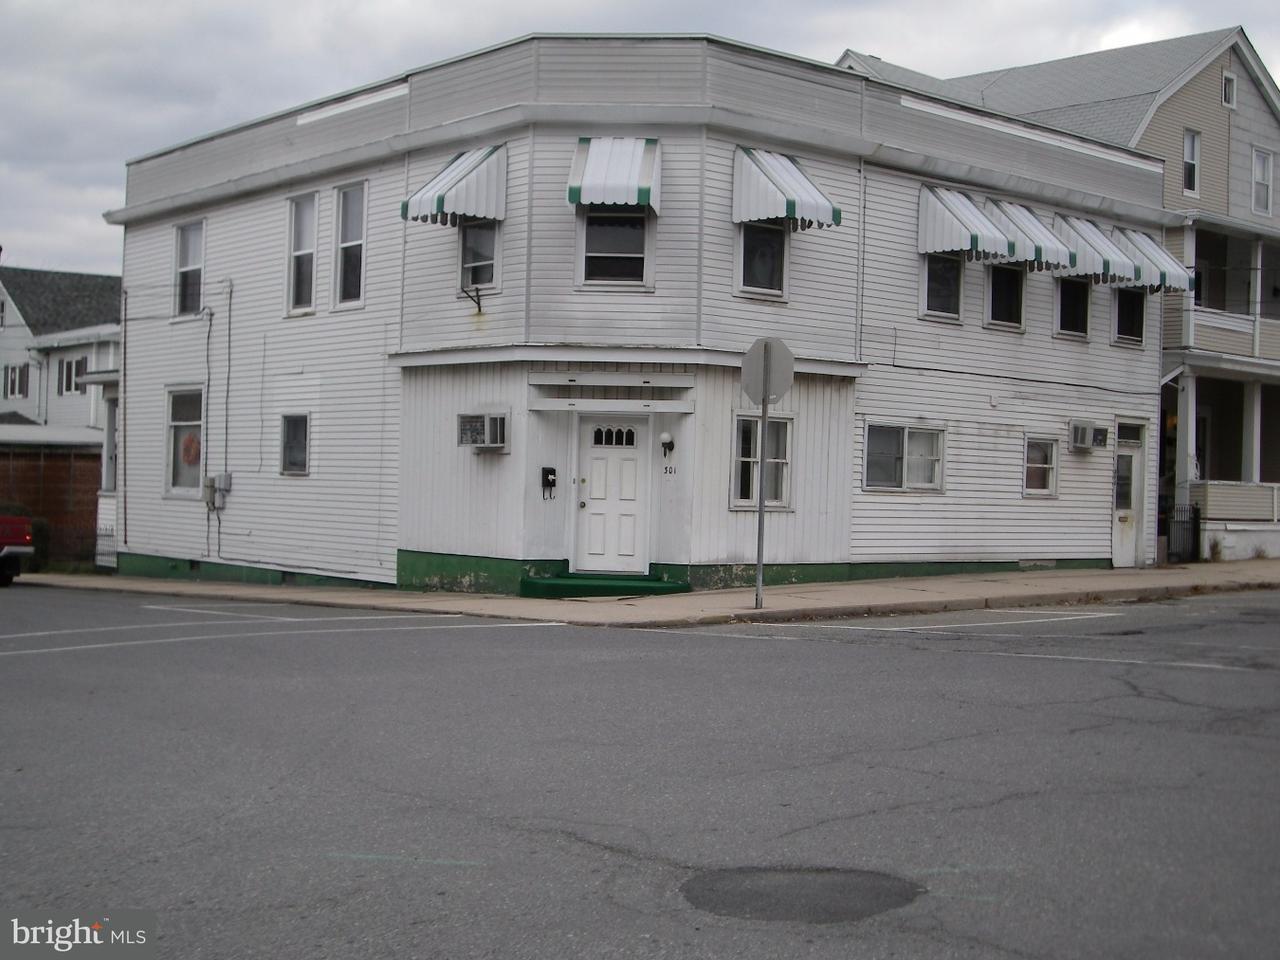 Quadraplex 为 销售 在 301 E BERTSCH Street Lansford, 宾夕法尼亚州 18232 美国